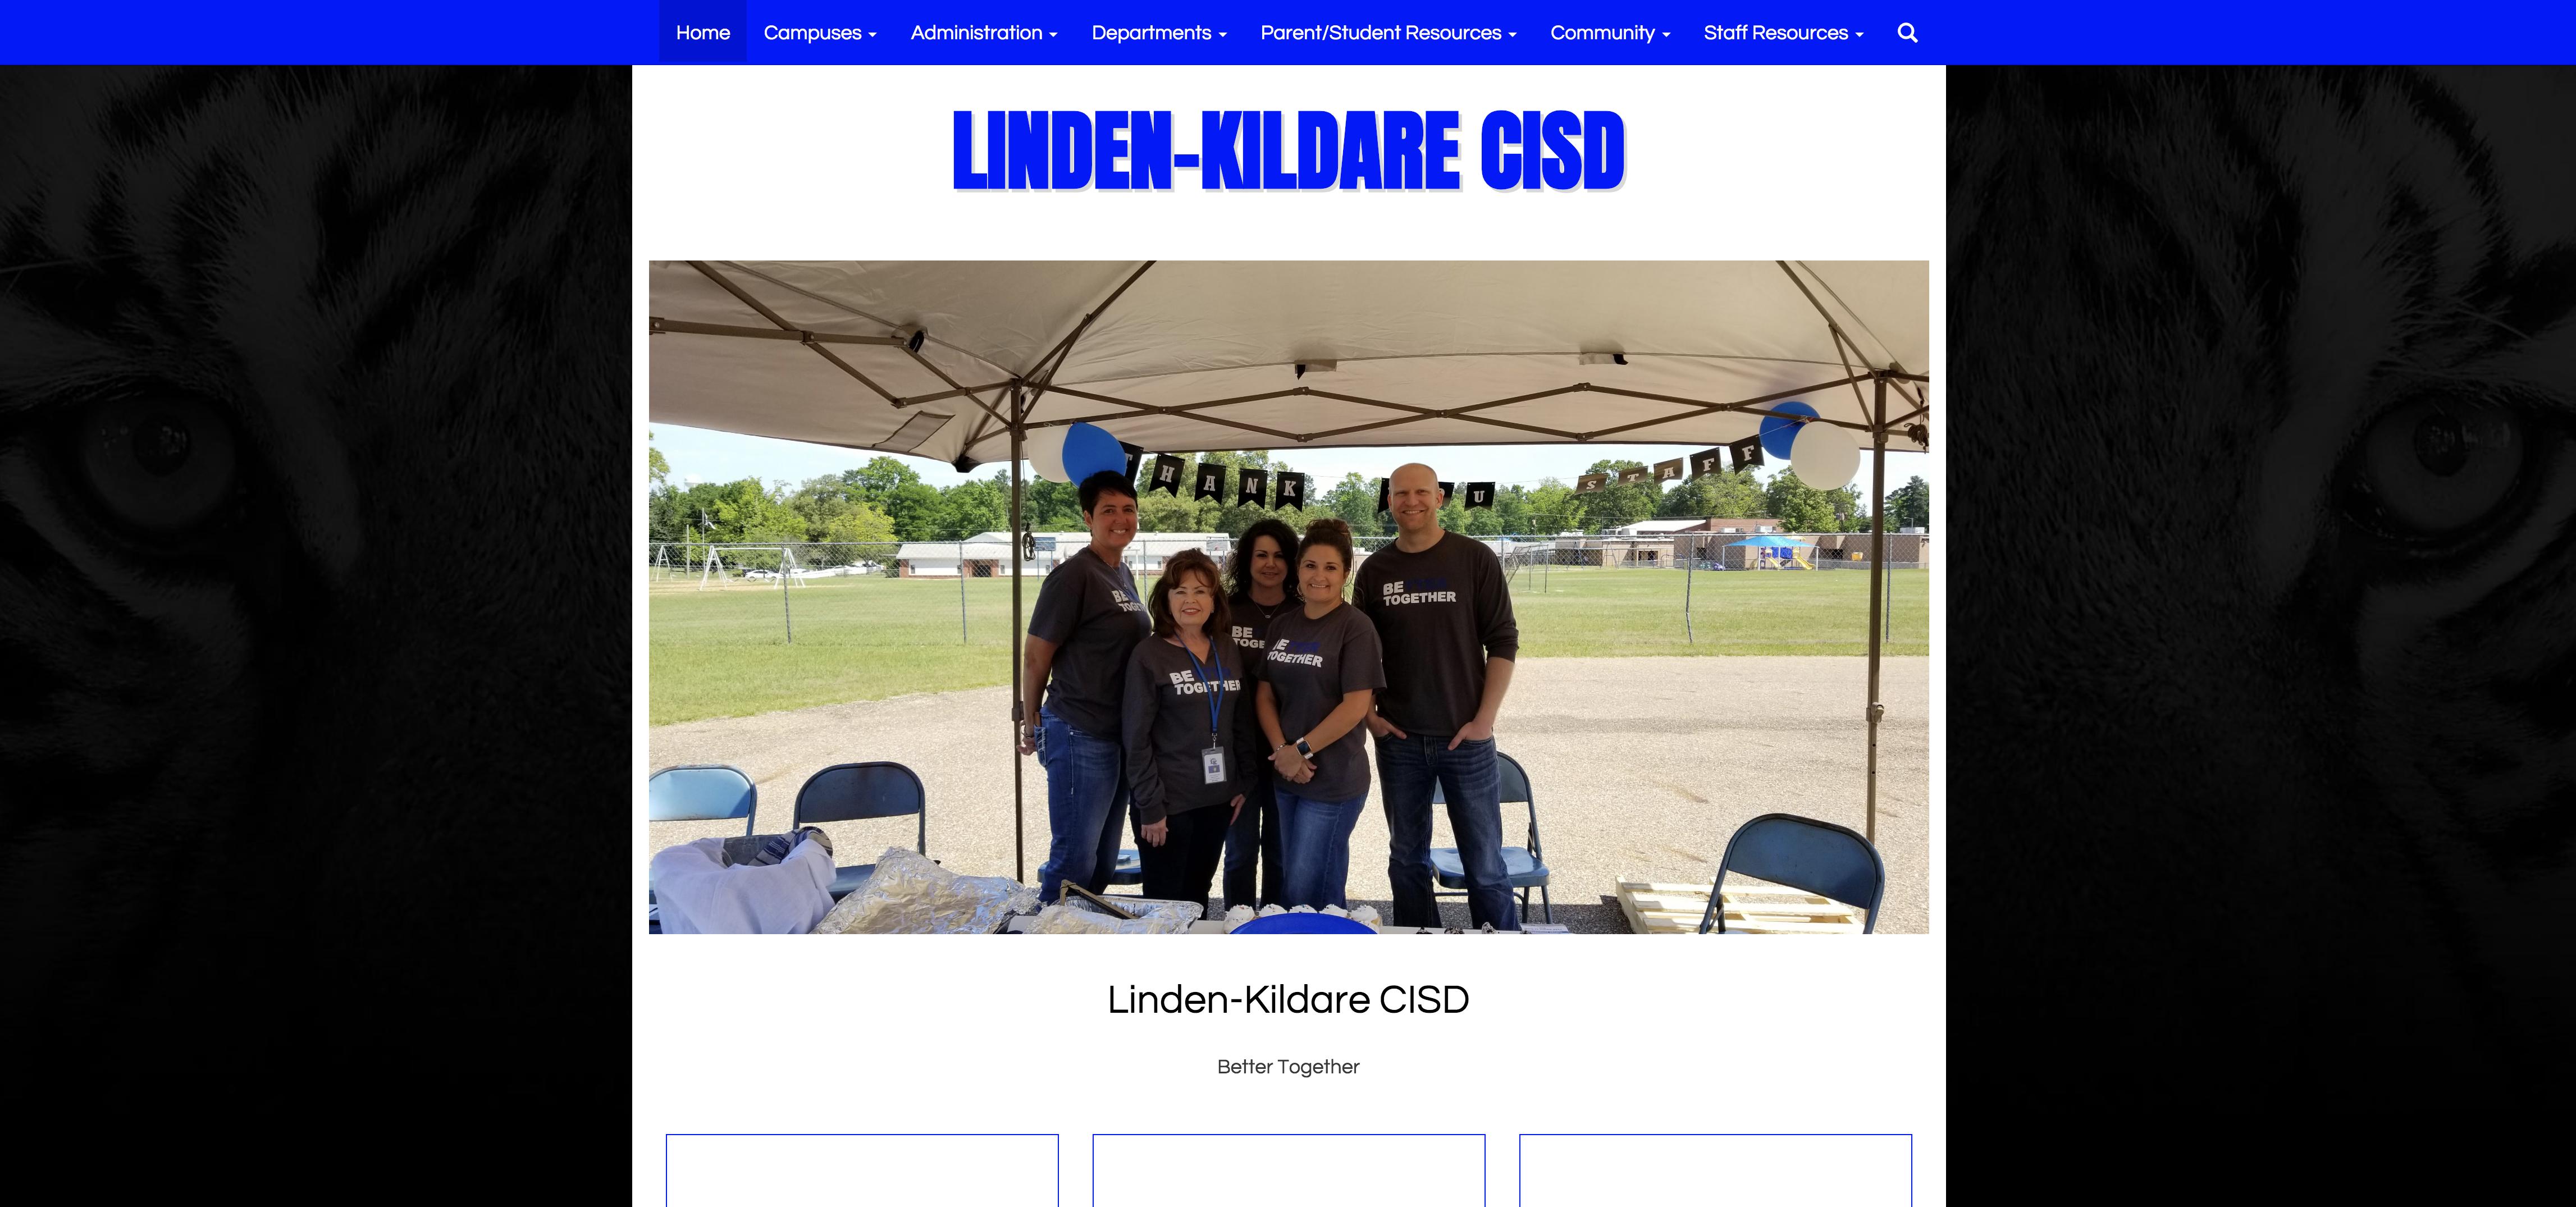 Linden-Kildare CISD